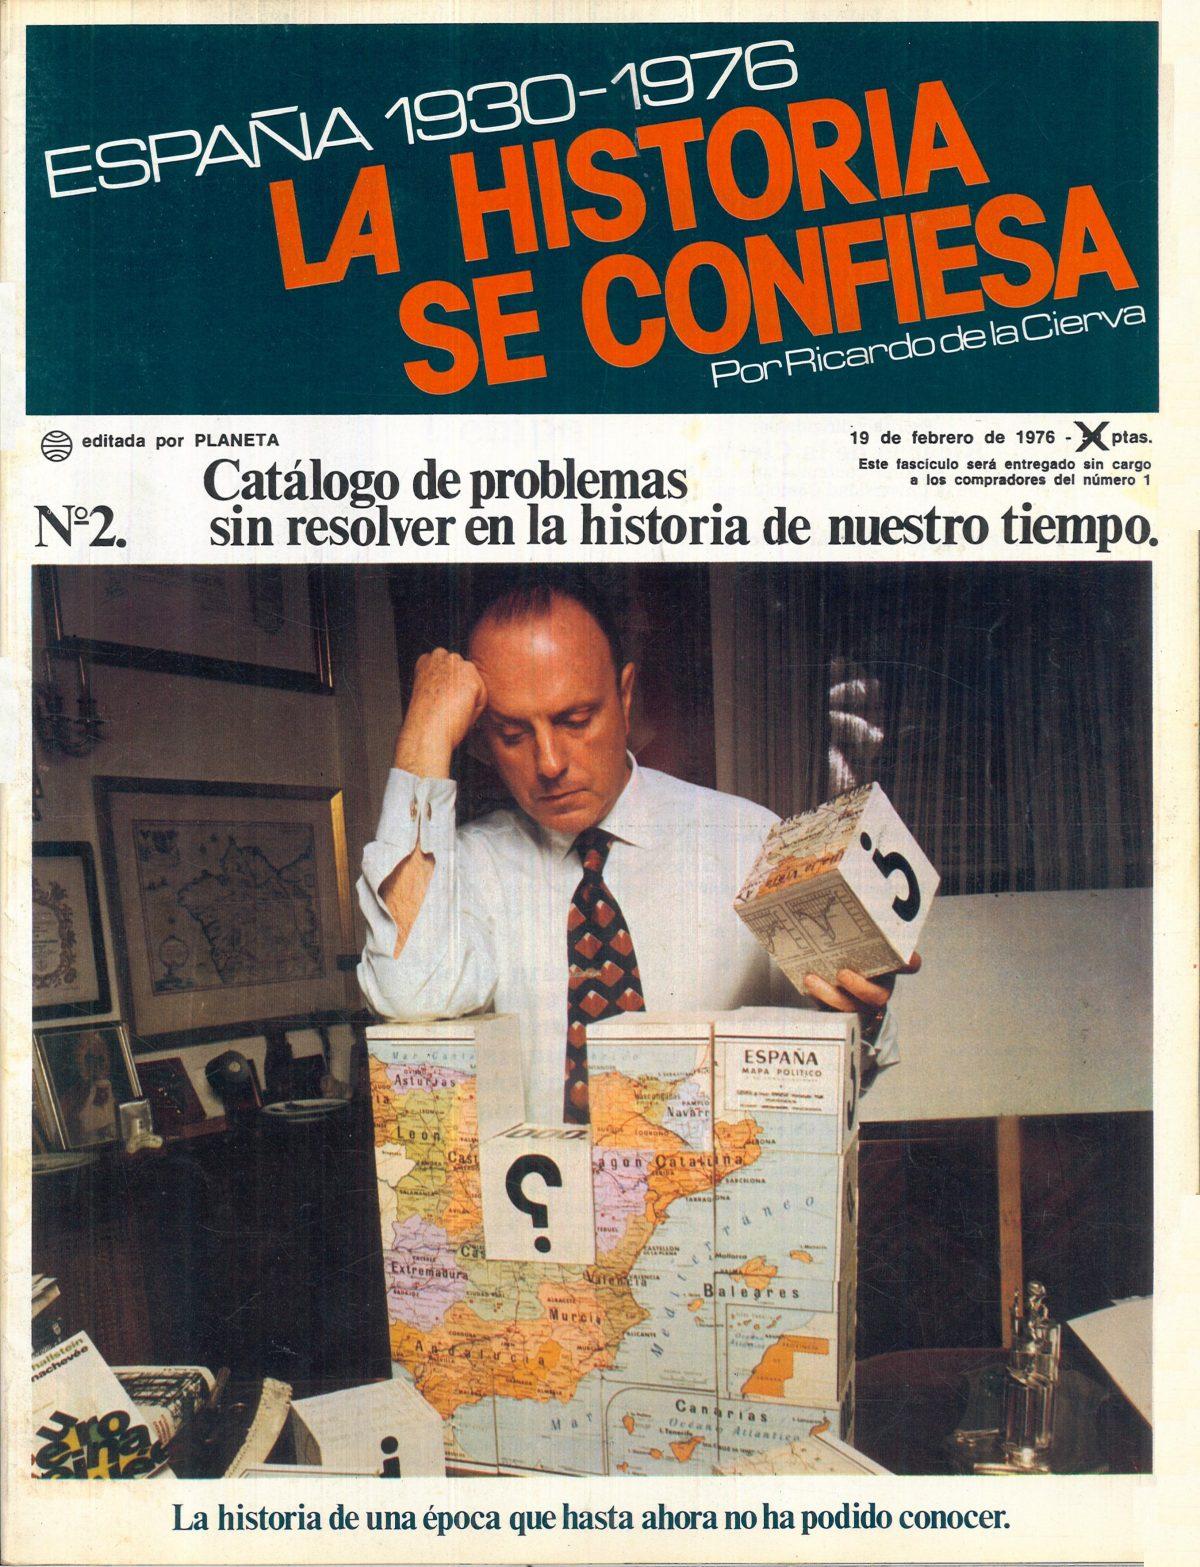 «España 1930-1976: La historia se confiesa»